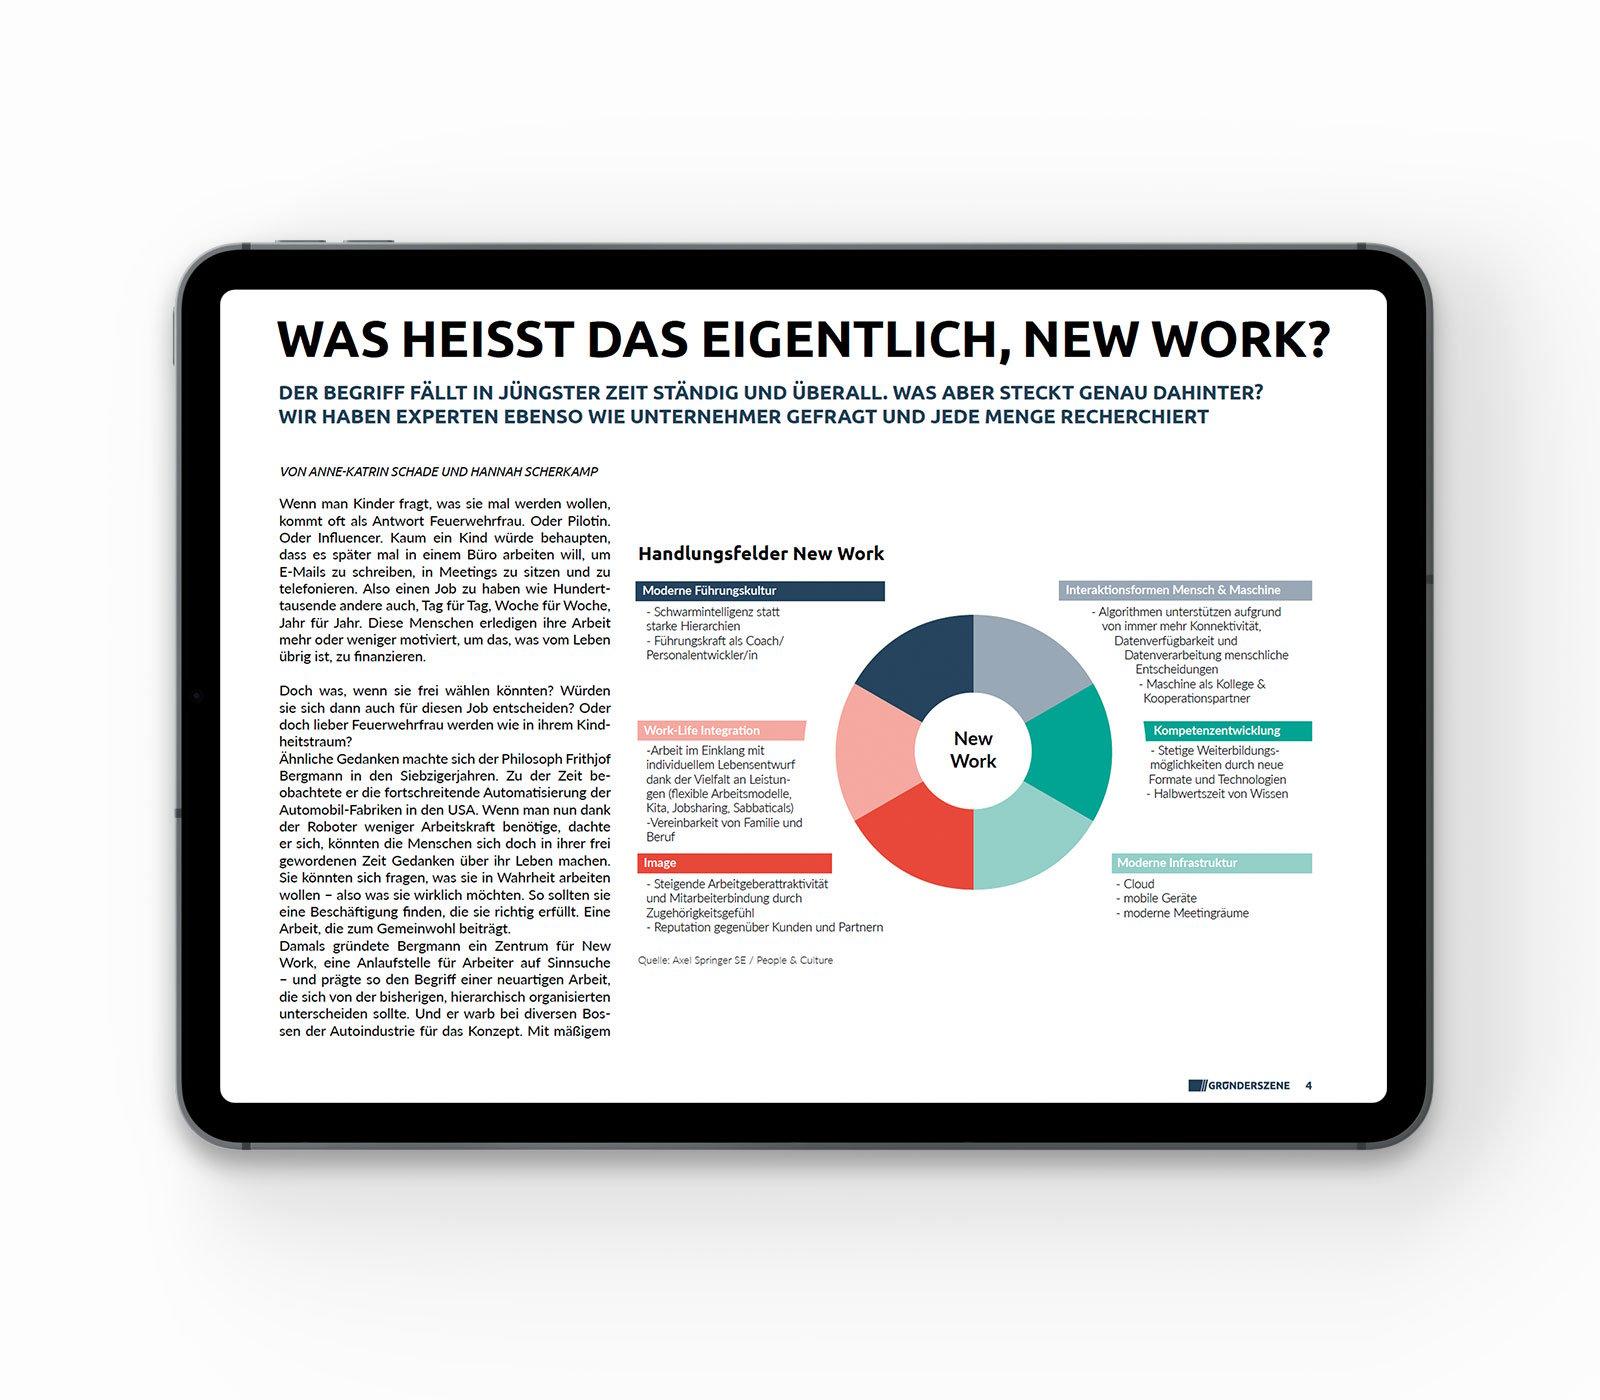 201903_GS-KI-Guide_Hubspot_Mockup_1600x1400_01_Neue_Ideen